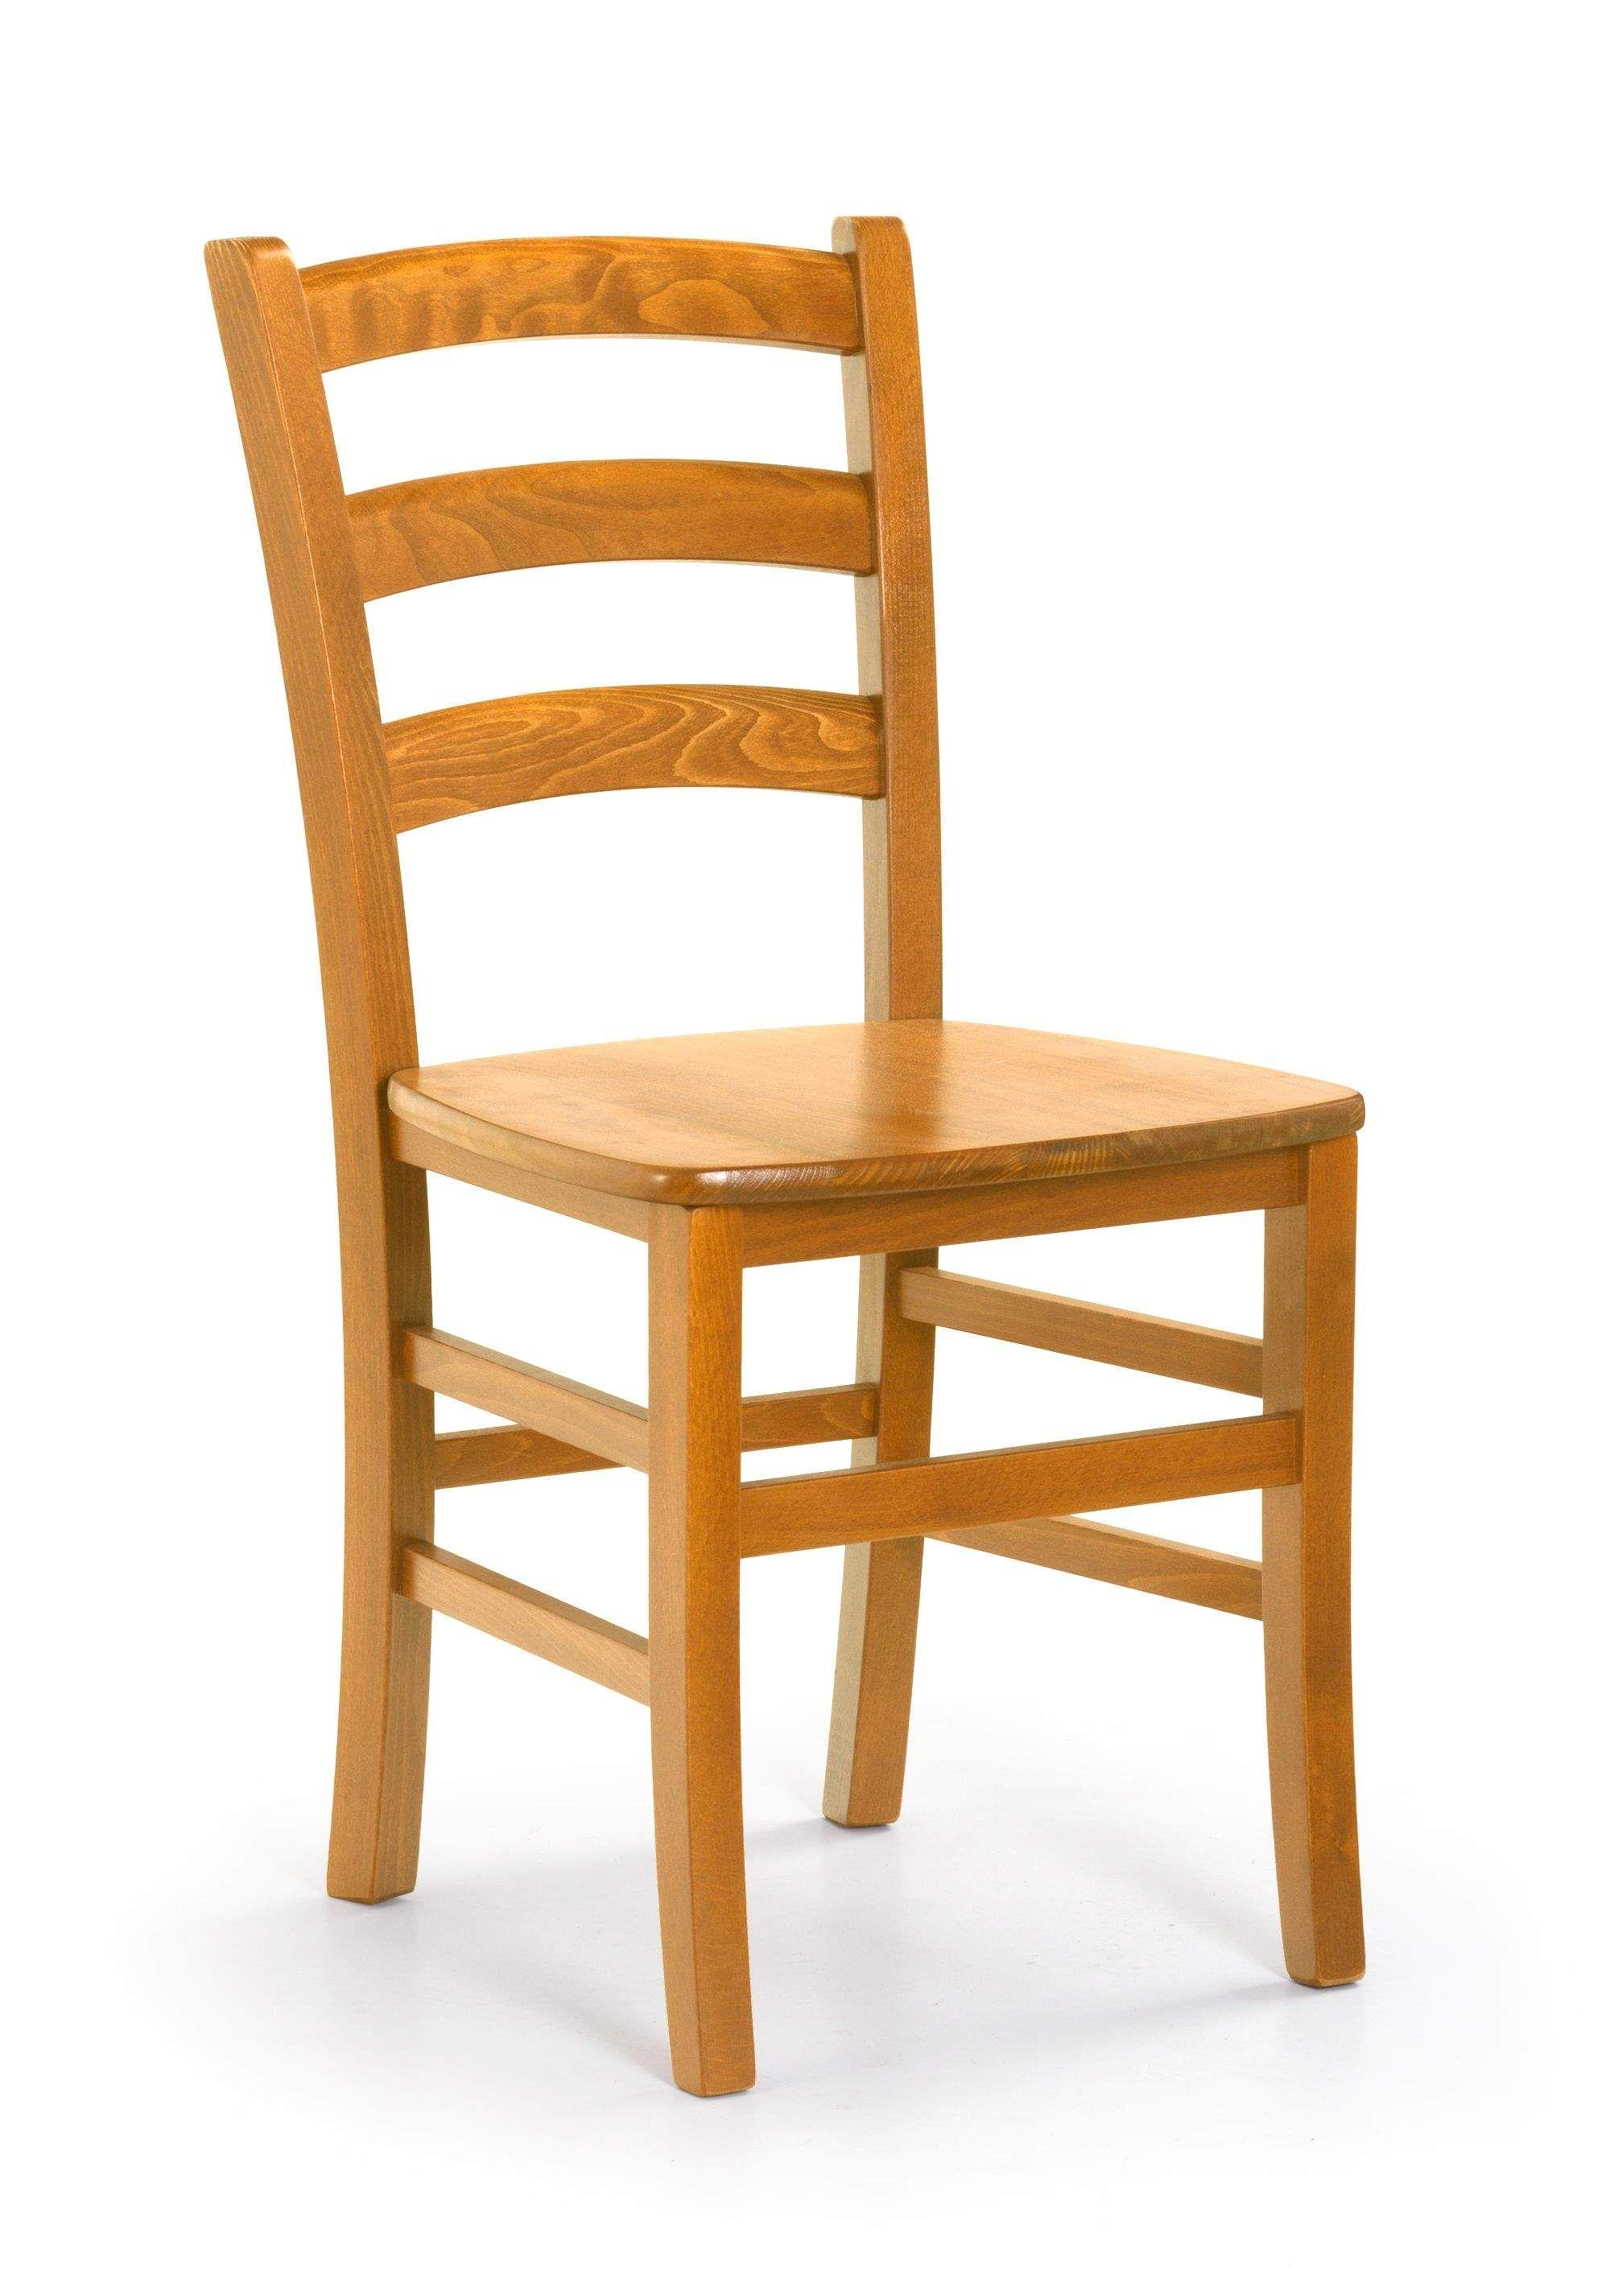 Kėdė RAFO alksnis